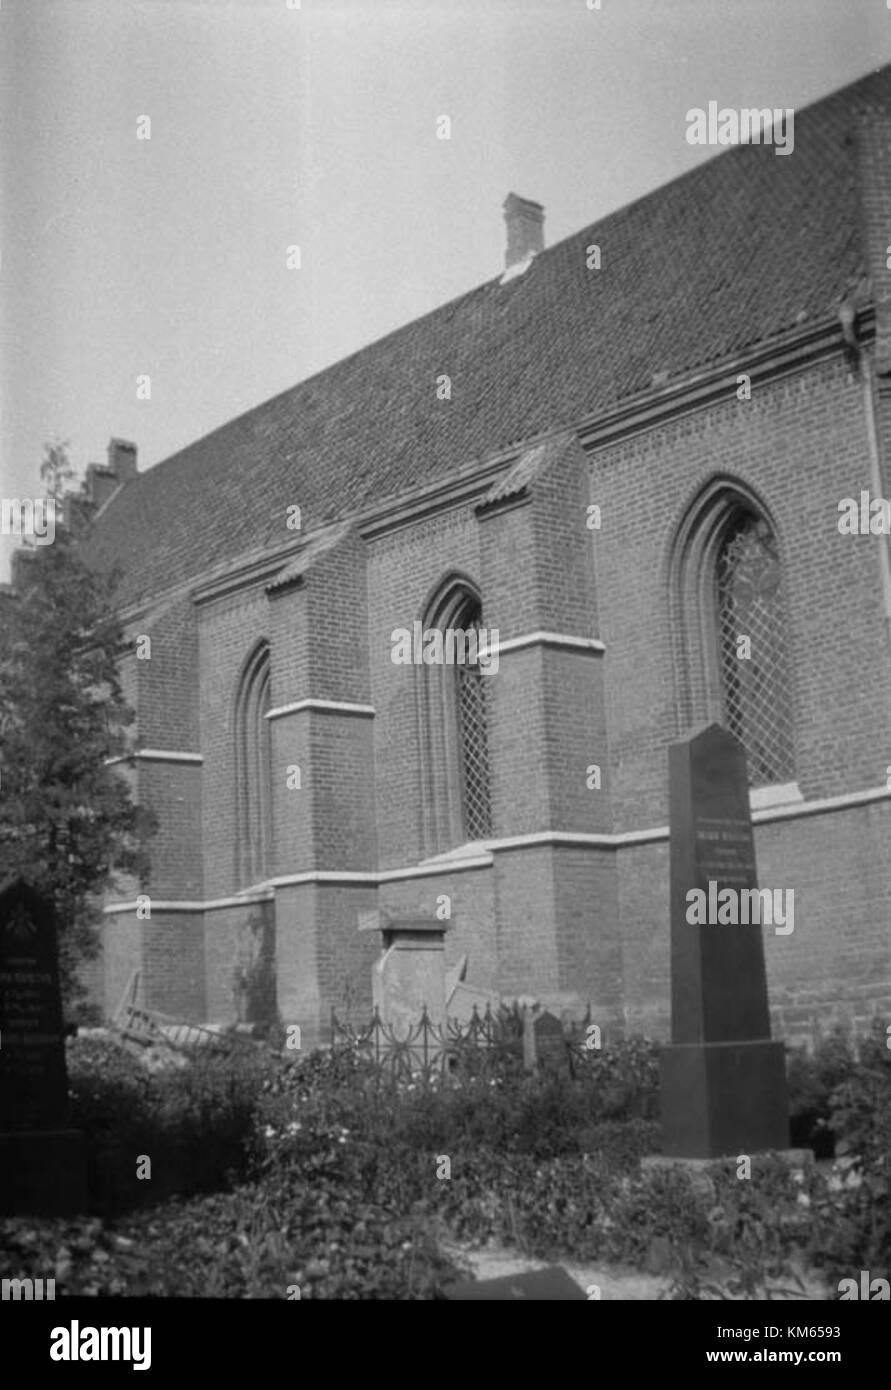 A W Rahmns fotosamling R-S - Lunds kommun